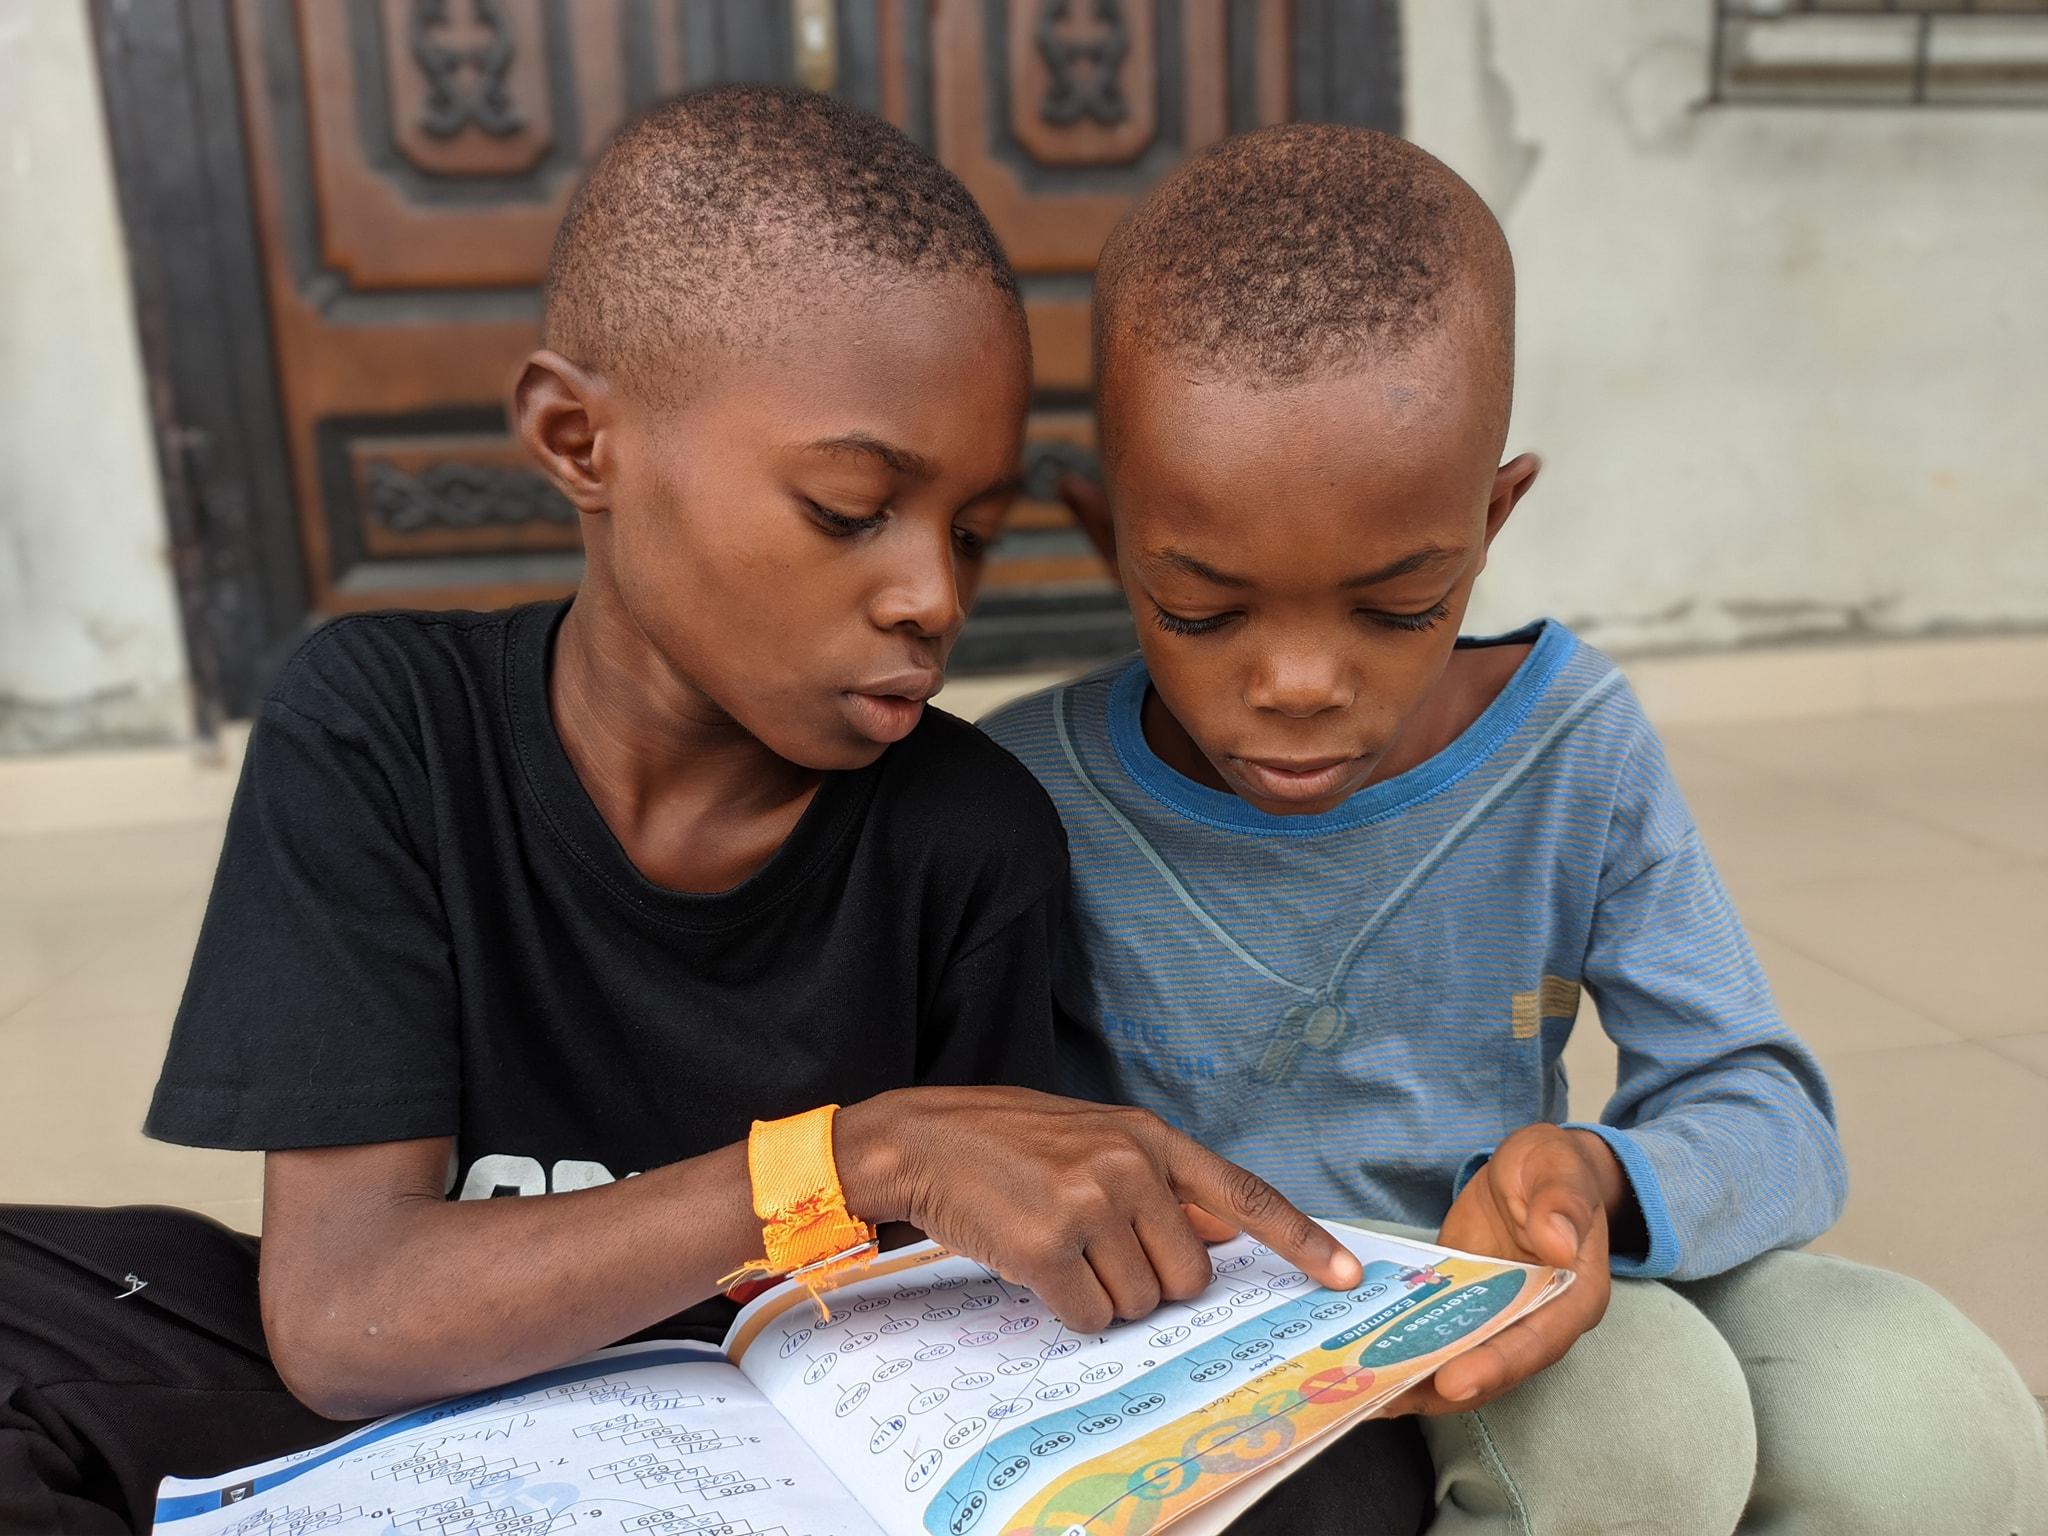 ACAEDF Land of Hope Children Center Reading